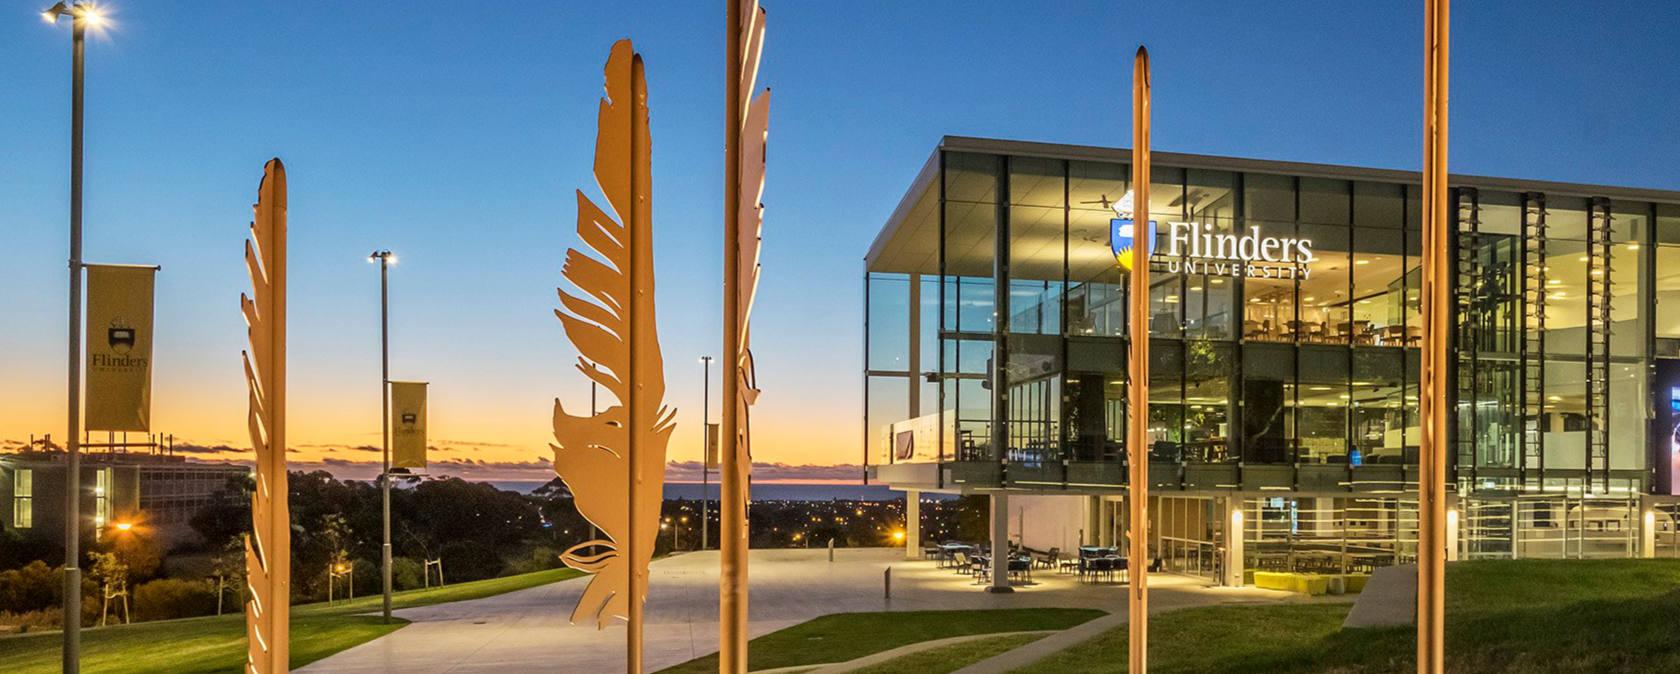 The Flinders University building